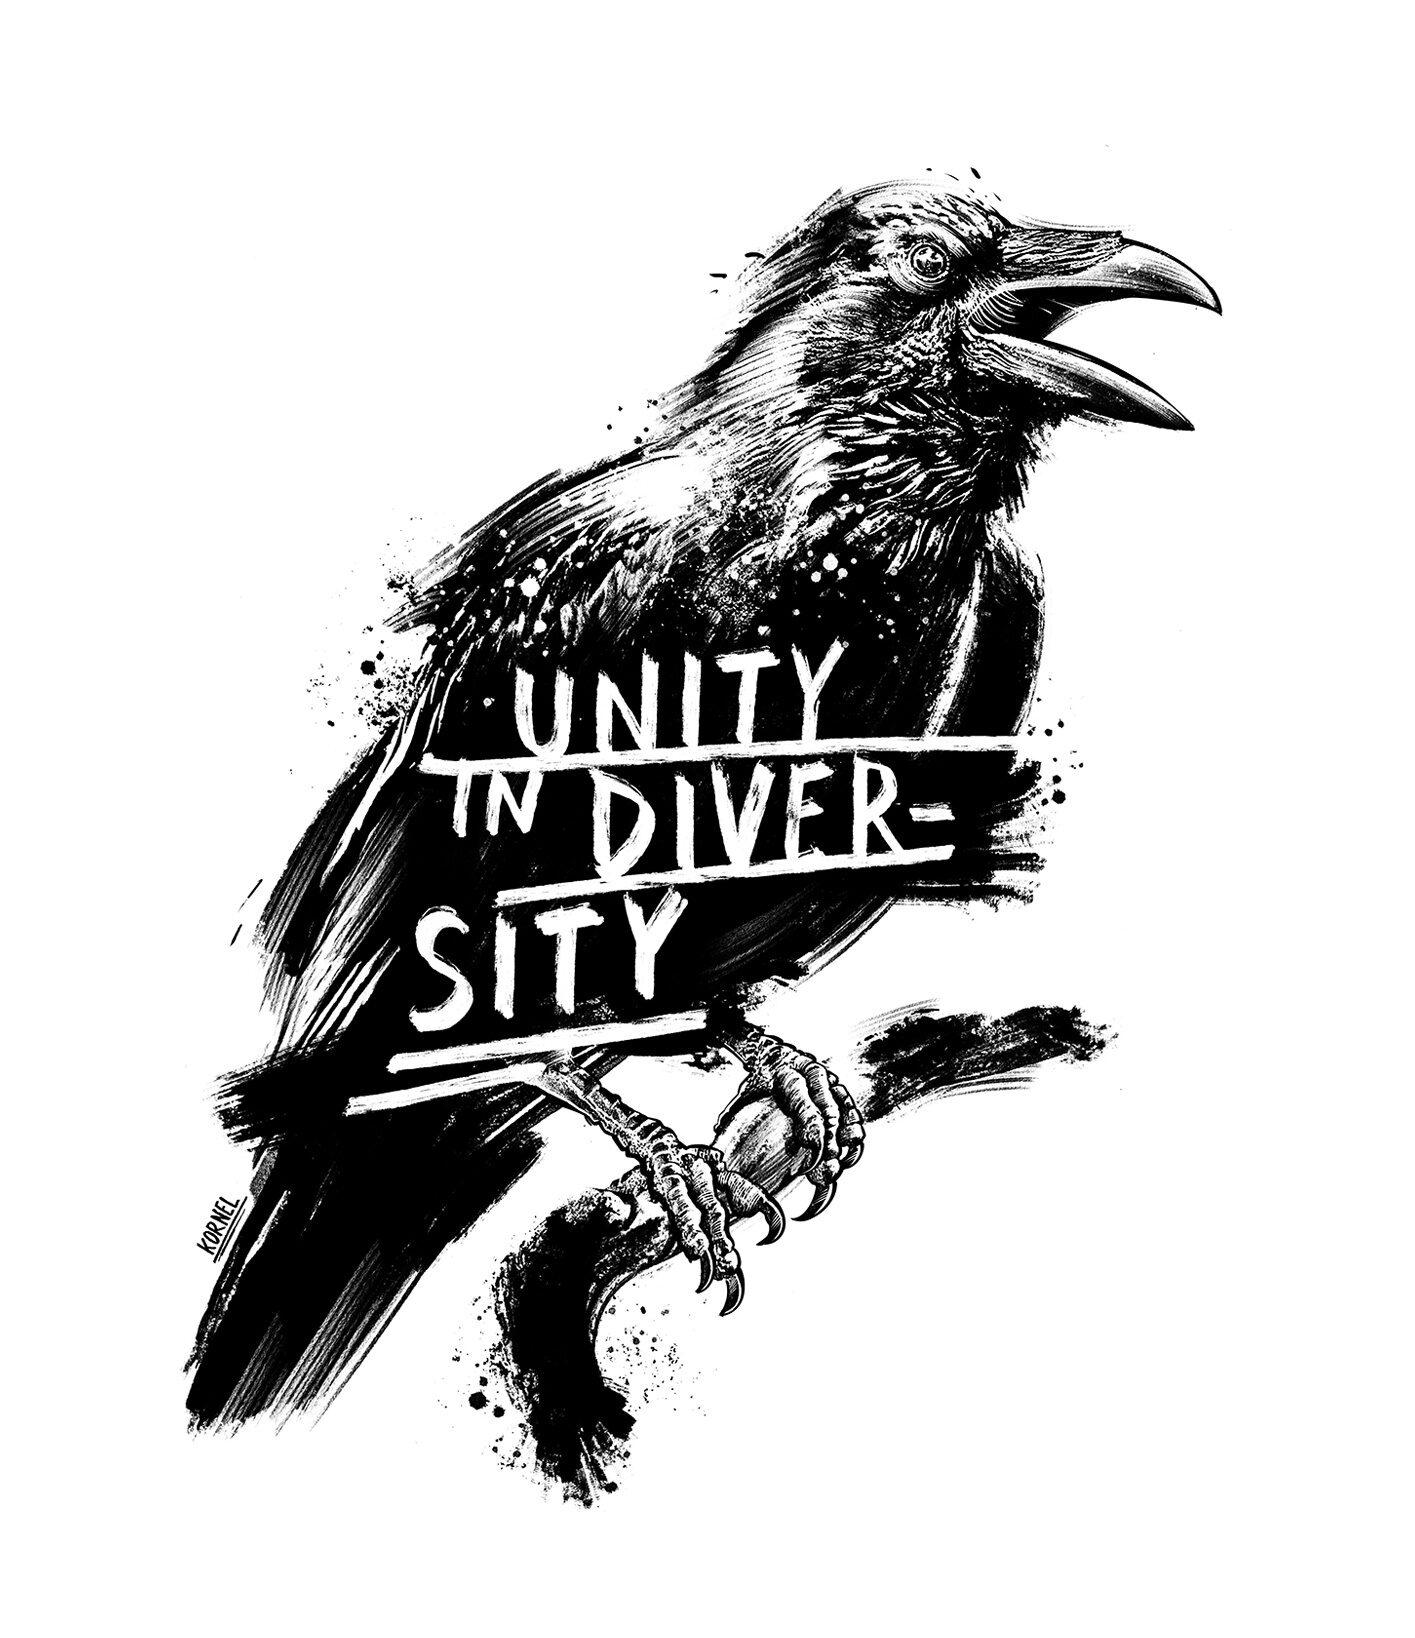 Radio Ra Be raven bern illustration drawing kornel - Kornel Illustration | Kornel Stadler portfolio